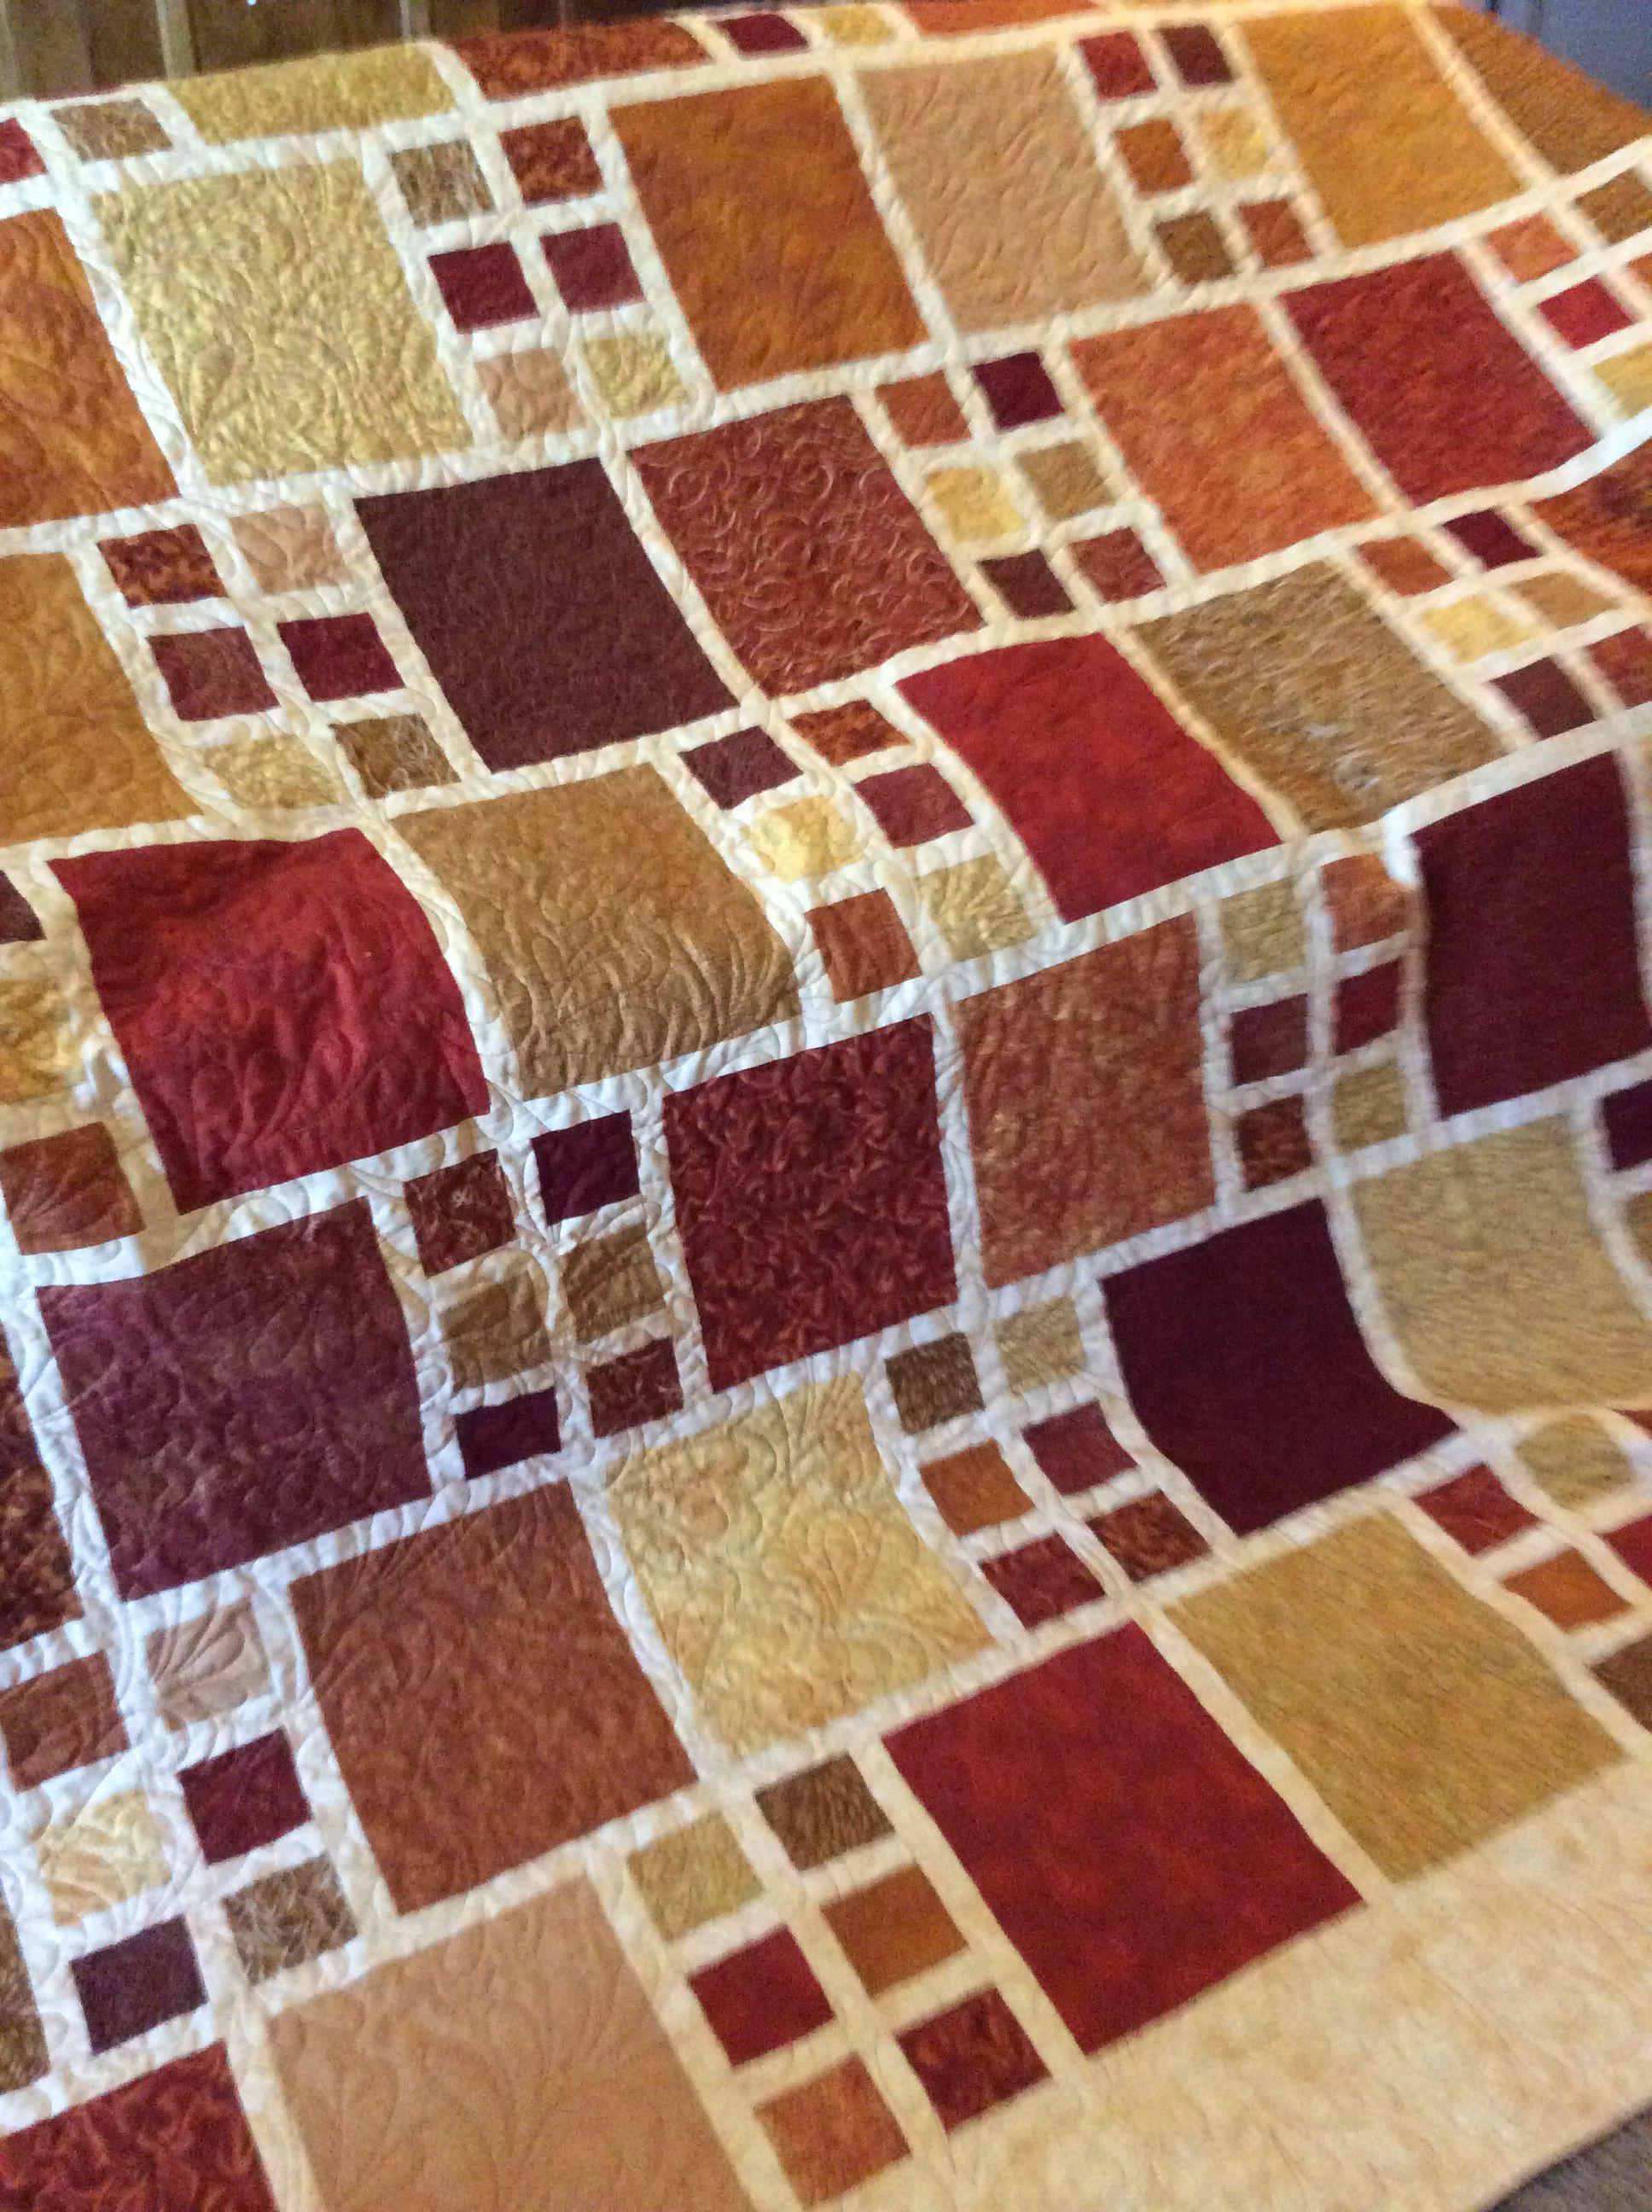 Custom Order 110x110 Modern Quilt In Cream Orange And